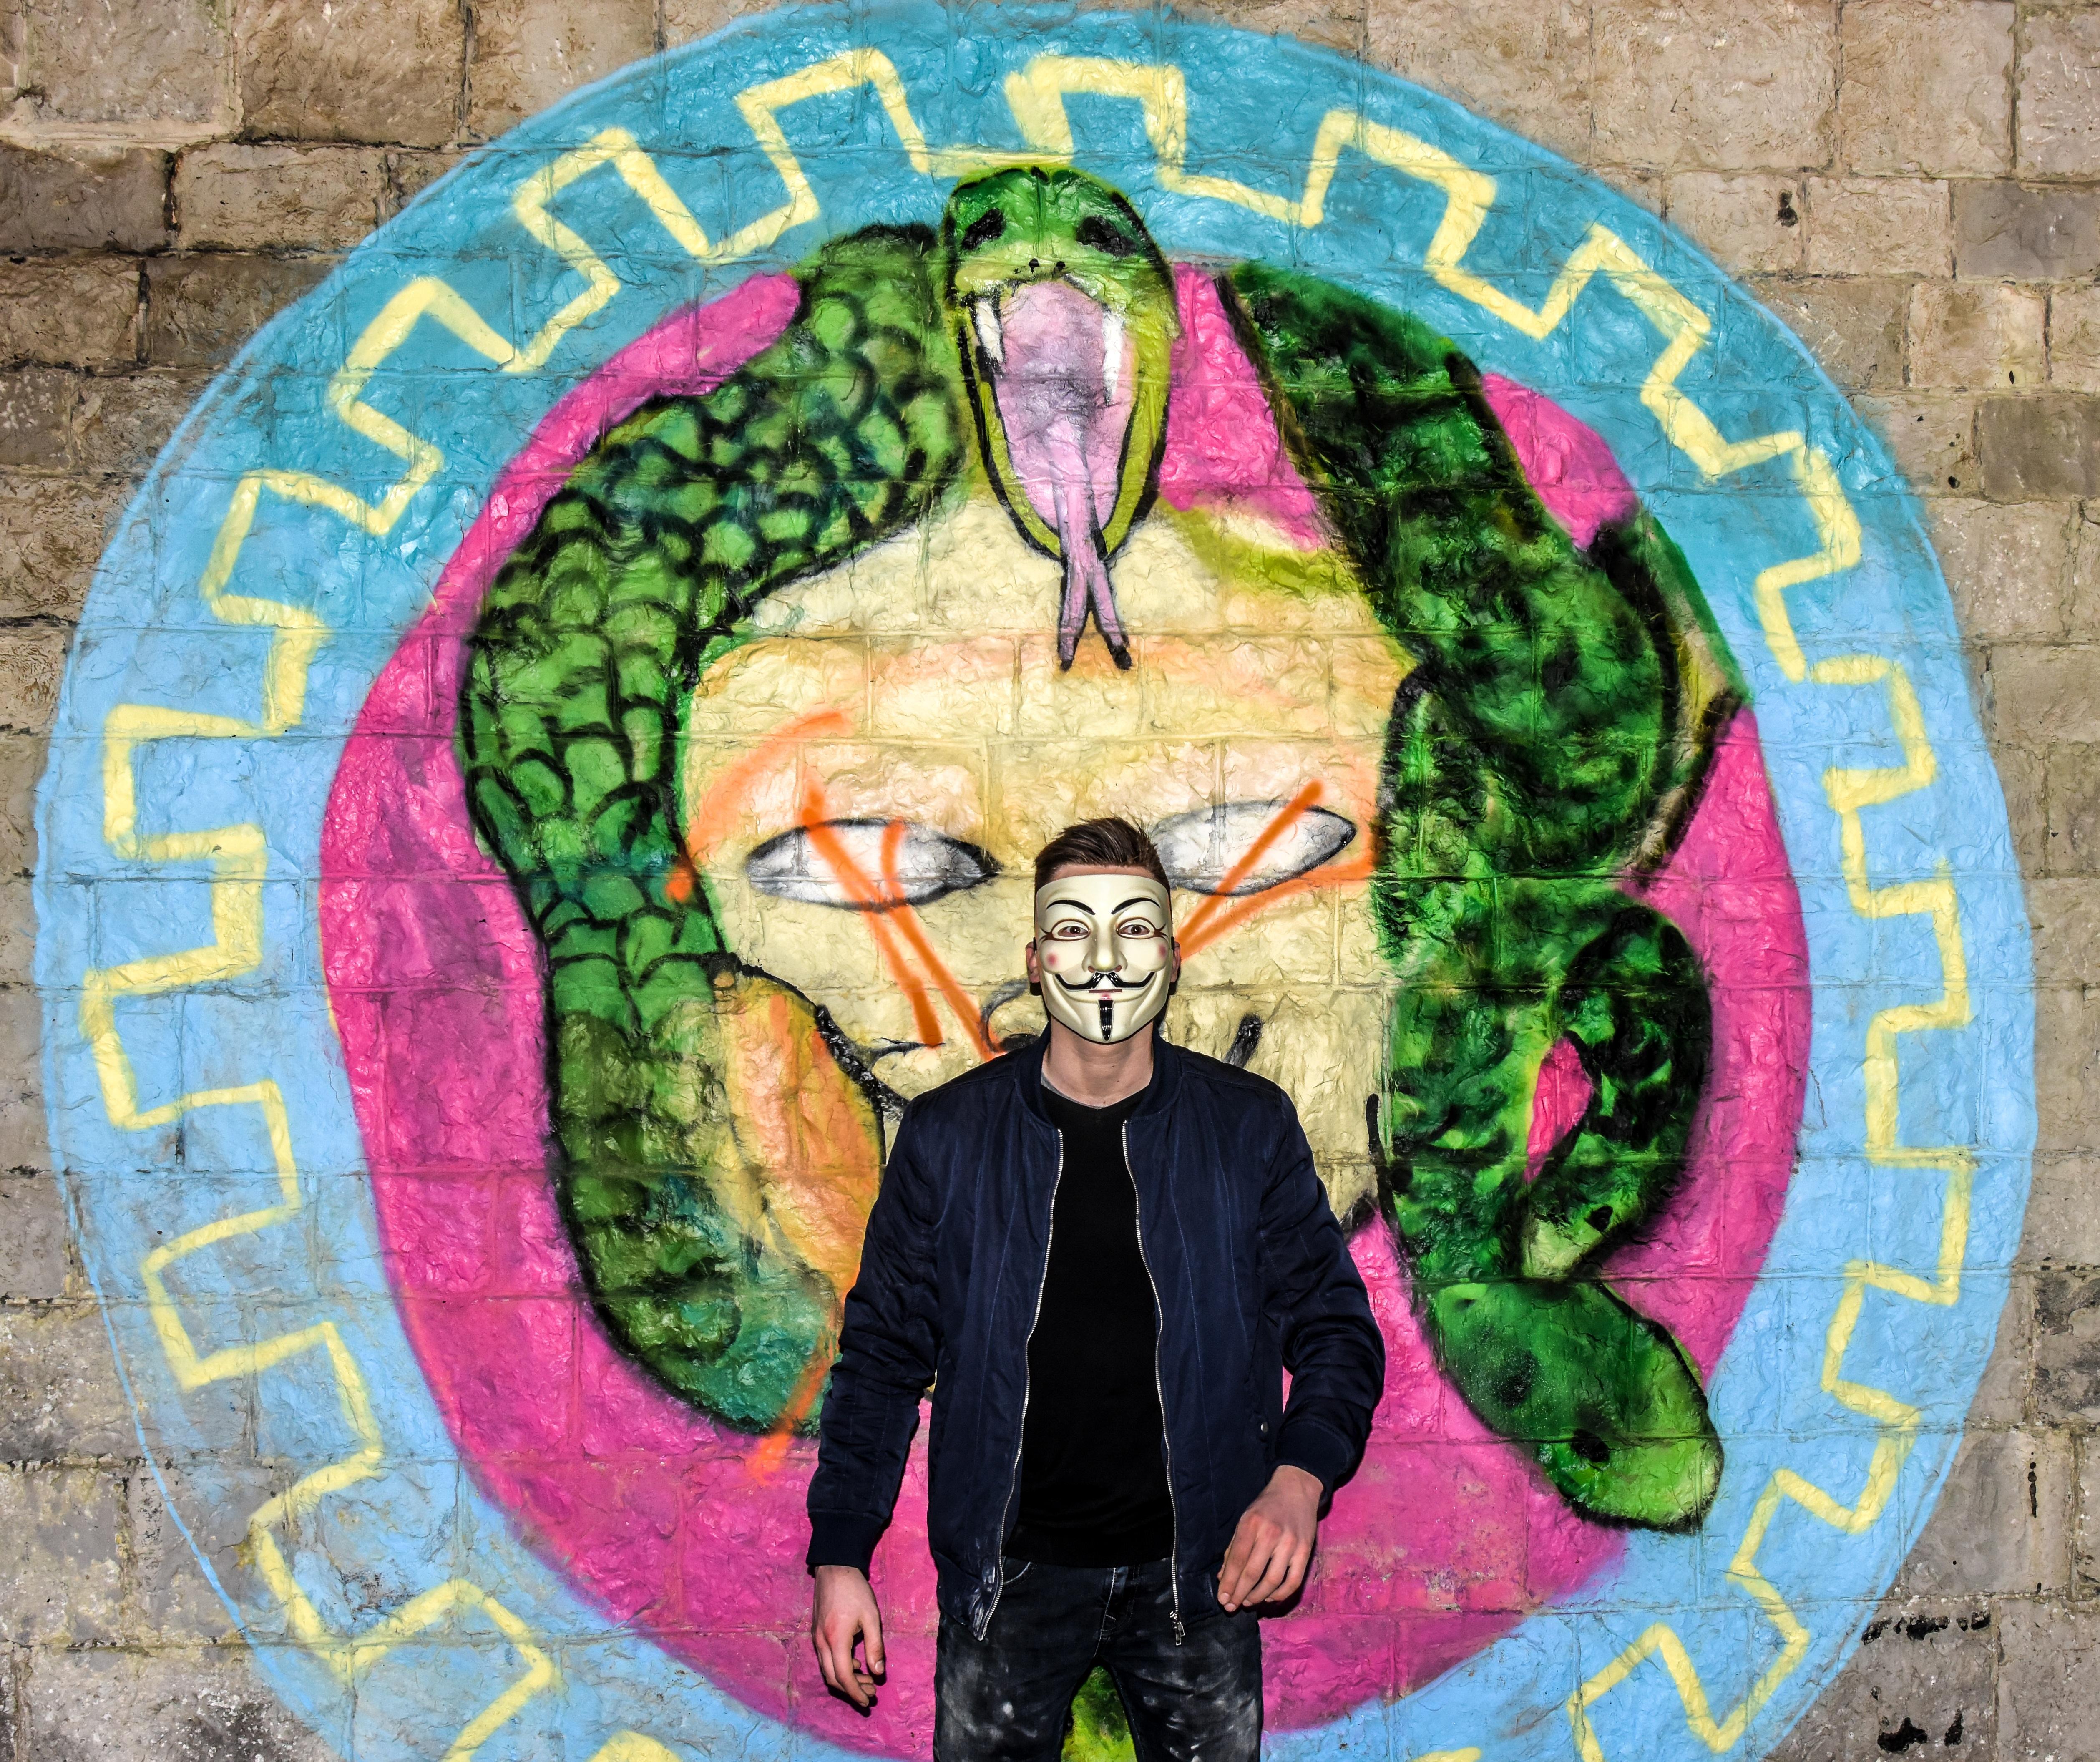 Gambar Manusia Jalan Anak Laki Laki Perkotaan Jelajahi Pria